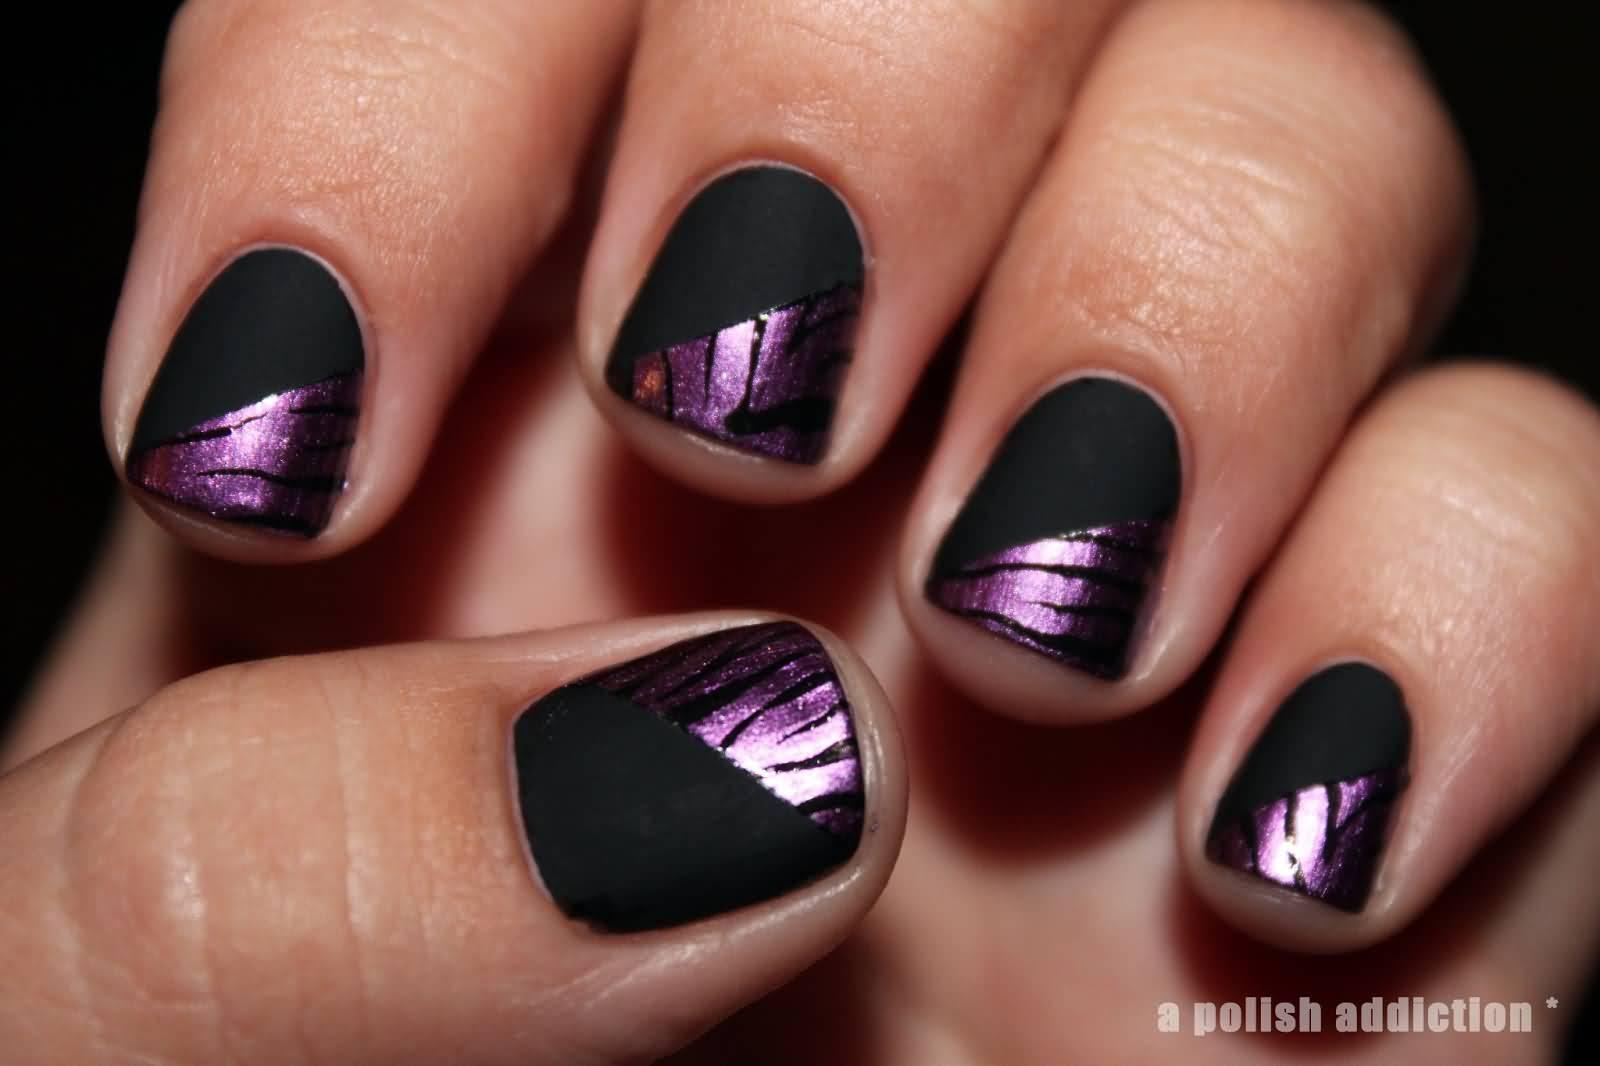 Eye Catching Black Matte Nails With Purple Tiger Print